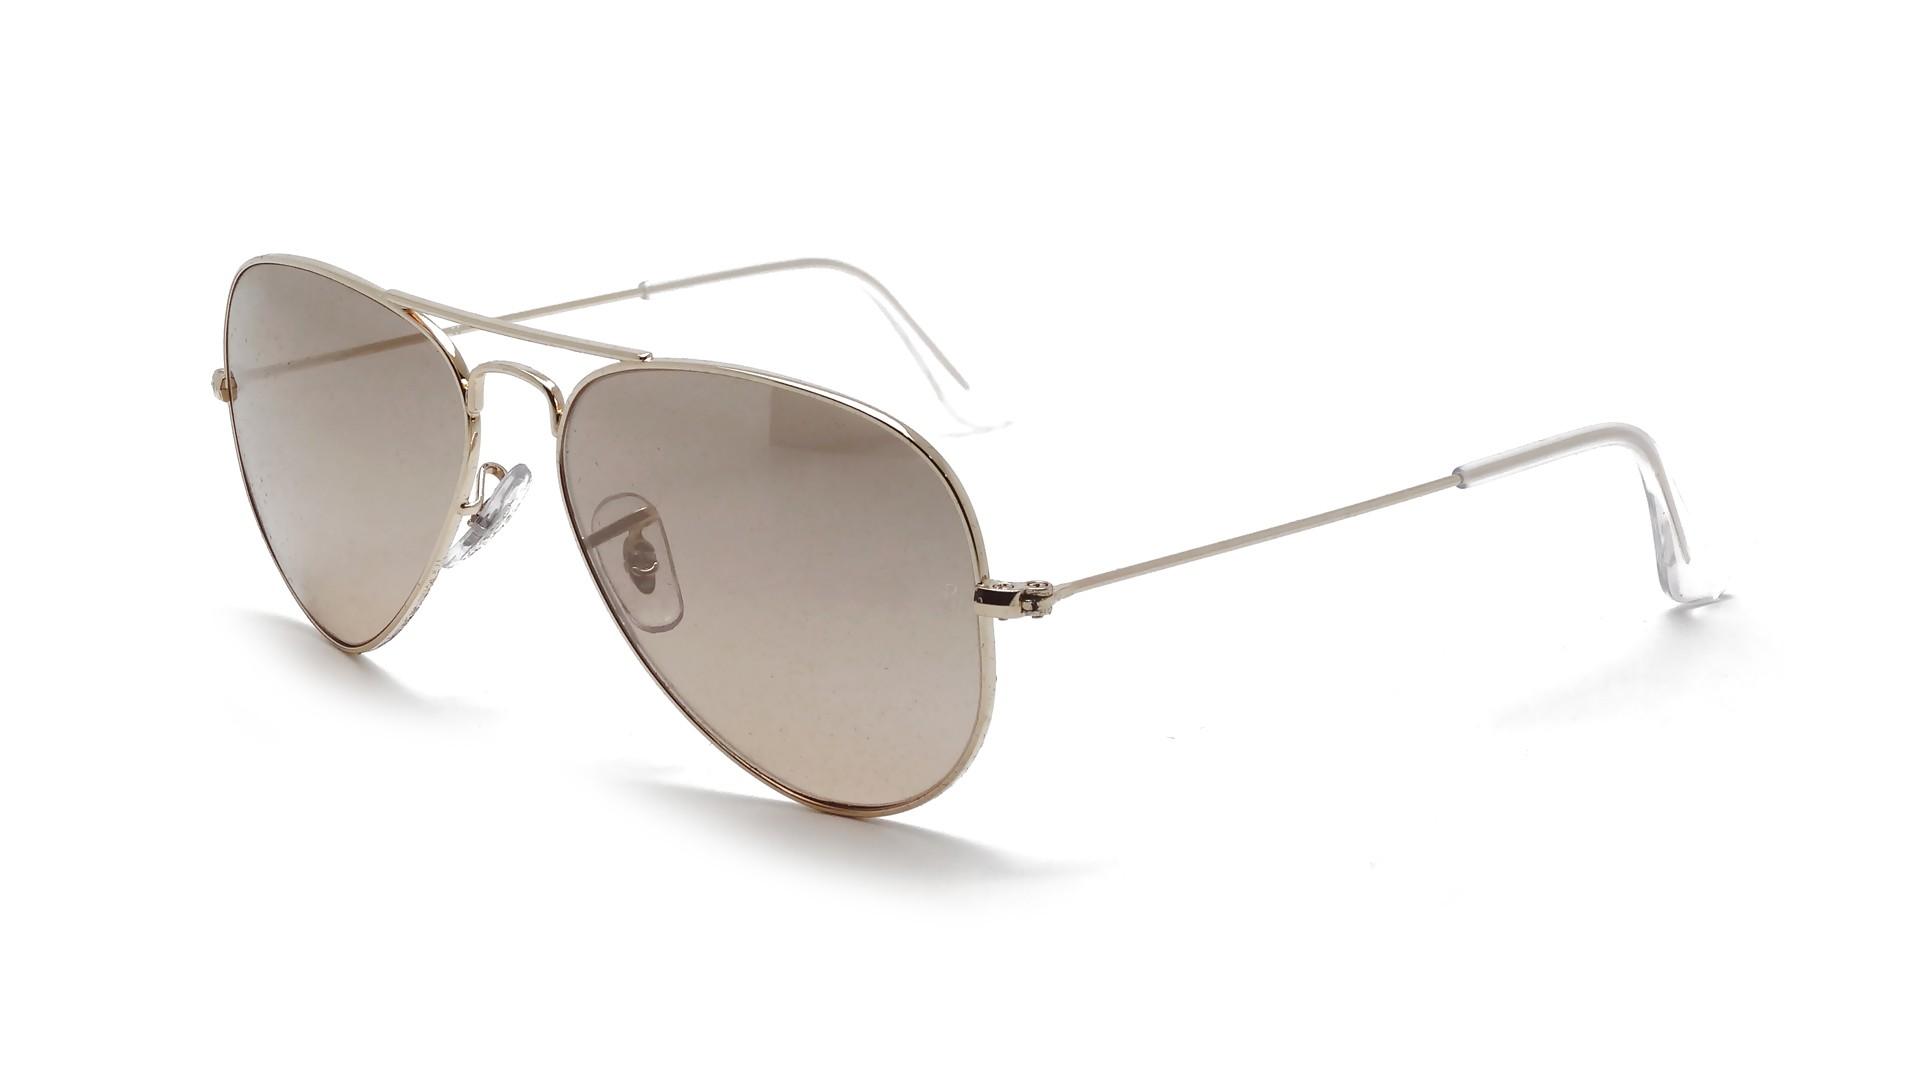 Ray ban aviator metal or rb3025 001 3e 55 14 prix 99 90 for Lunettes de soleil ray ban aviator miroir